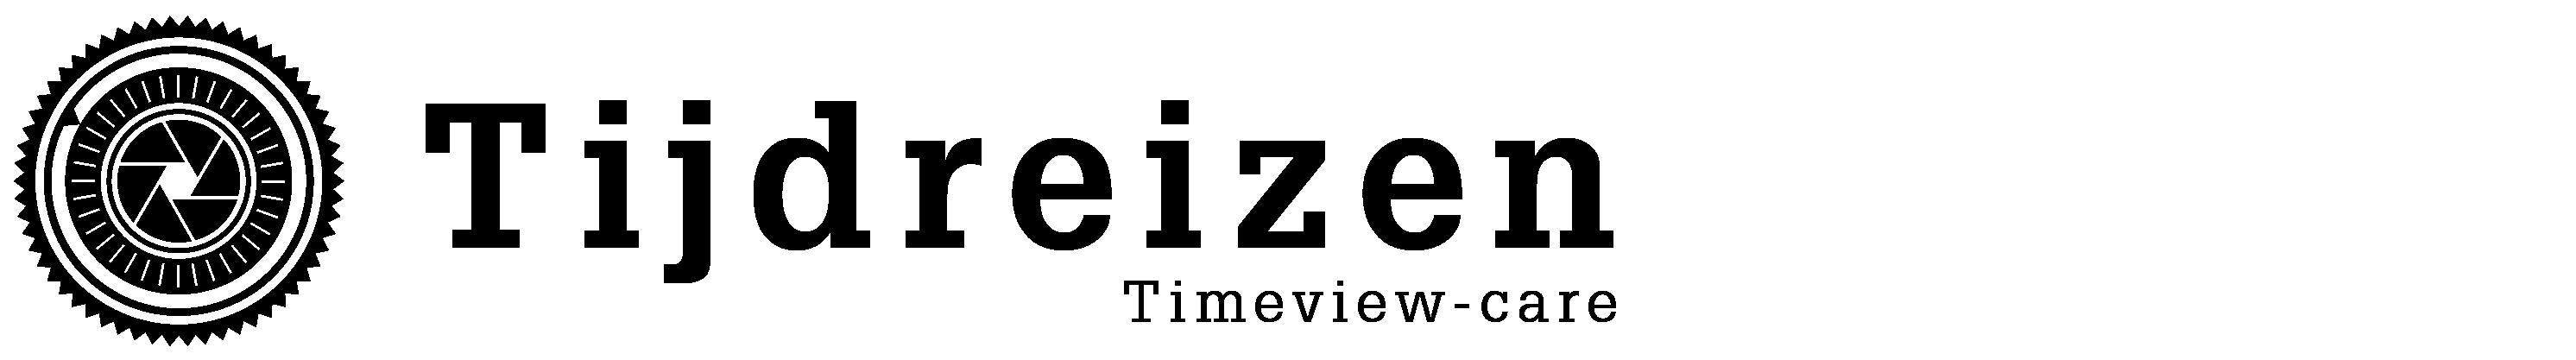 Timeview_care_Tijdreizen_Logo_Horizontal